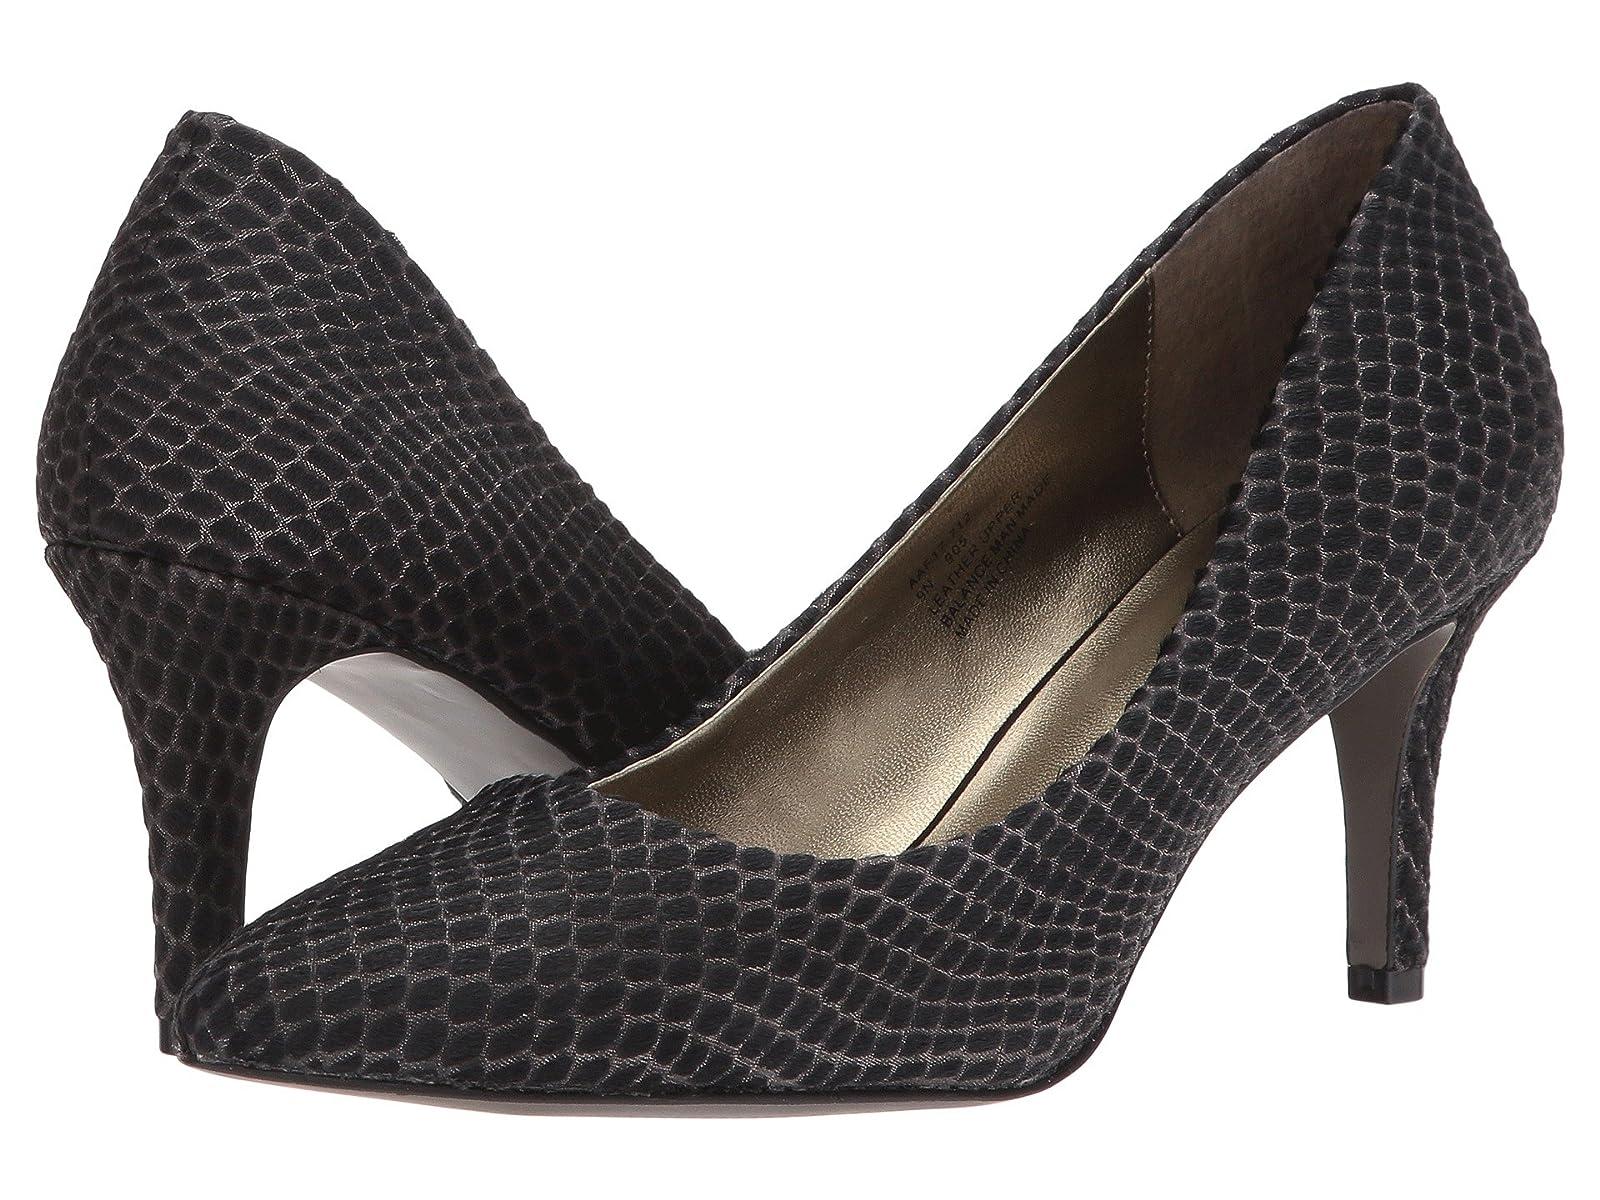 David Tate SymphonyCheap and distinctive eye-catching shoes